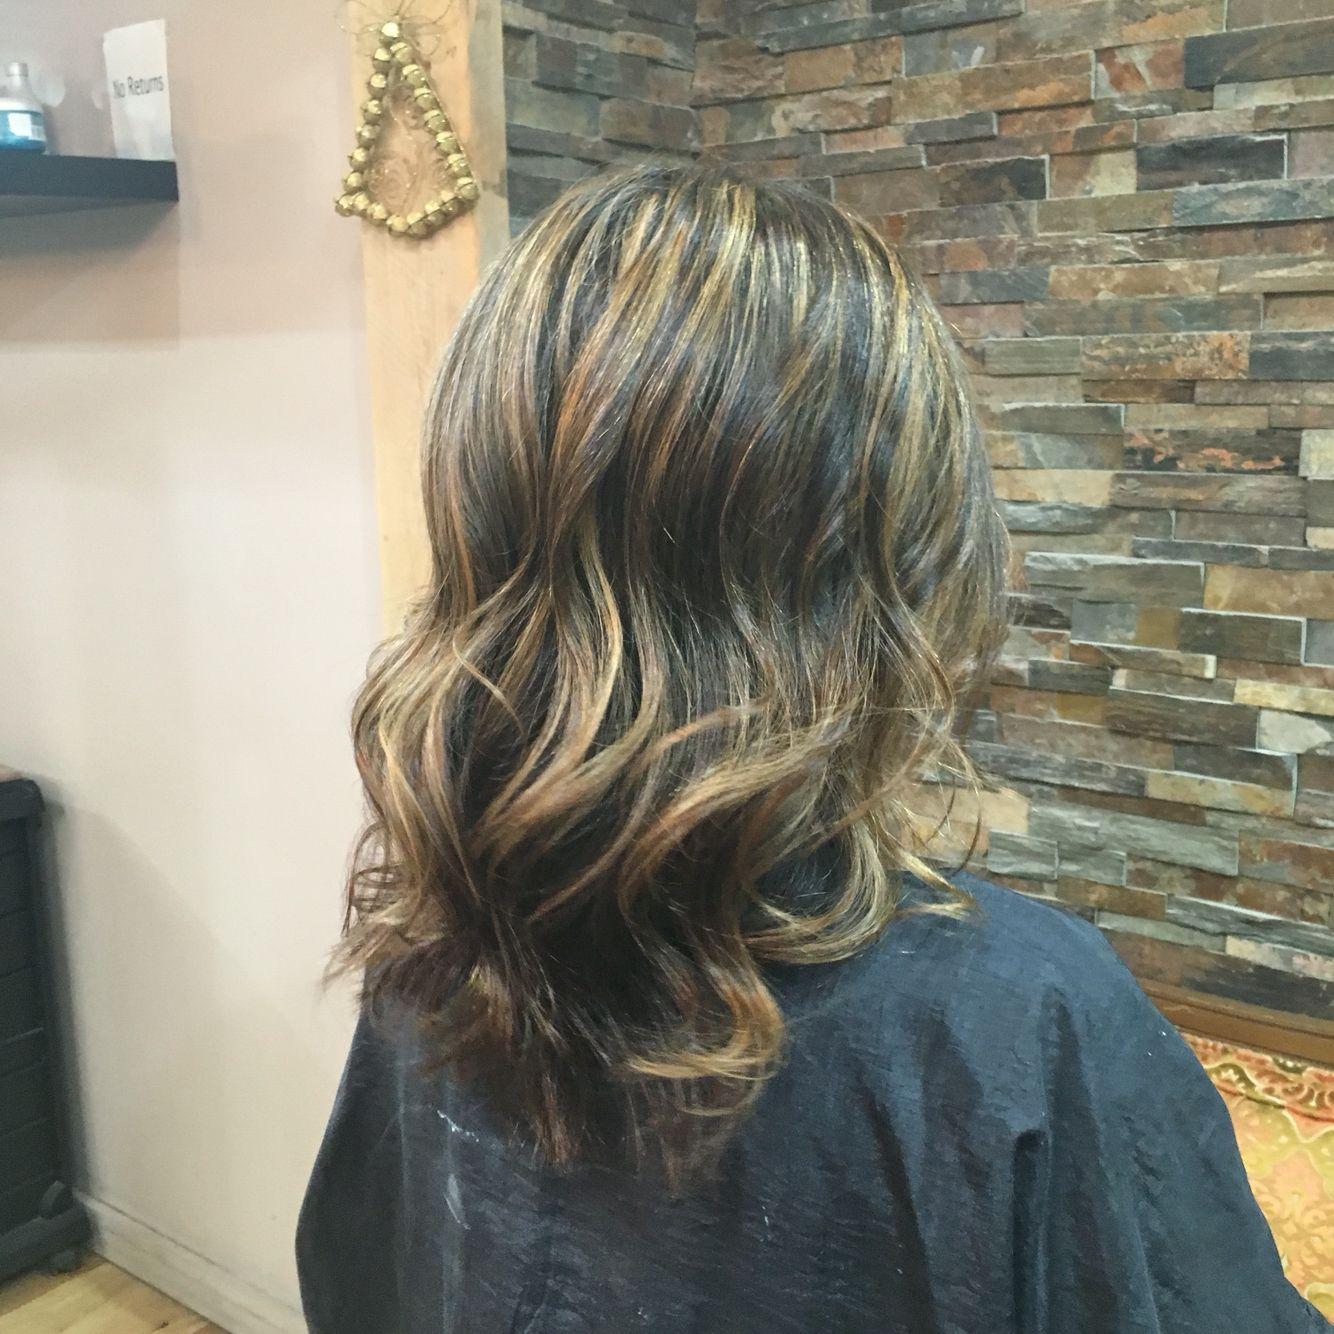 Highlights, curly hair, haircut, hair style, brunette, blond highlights